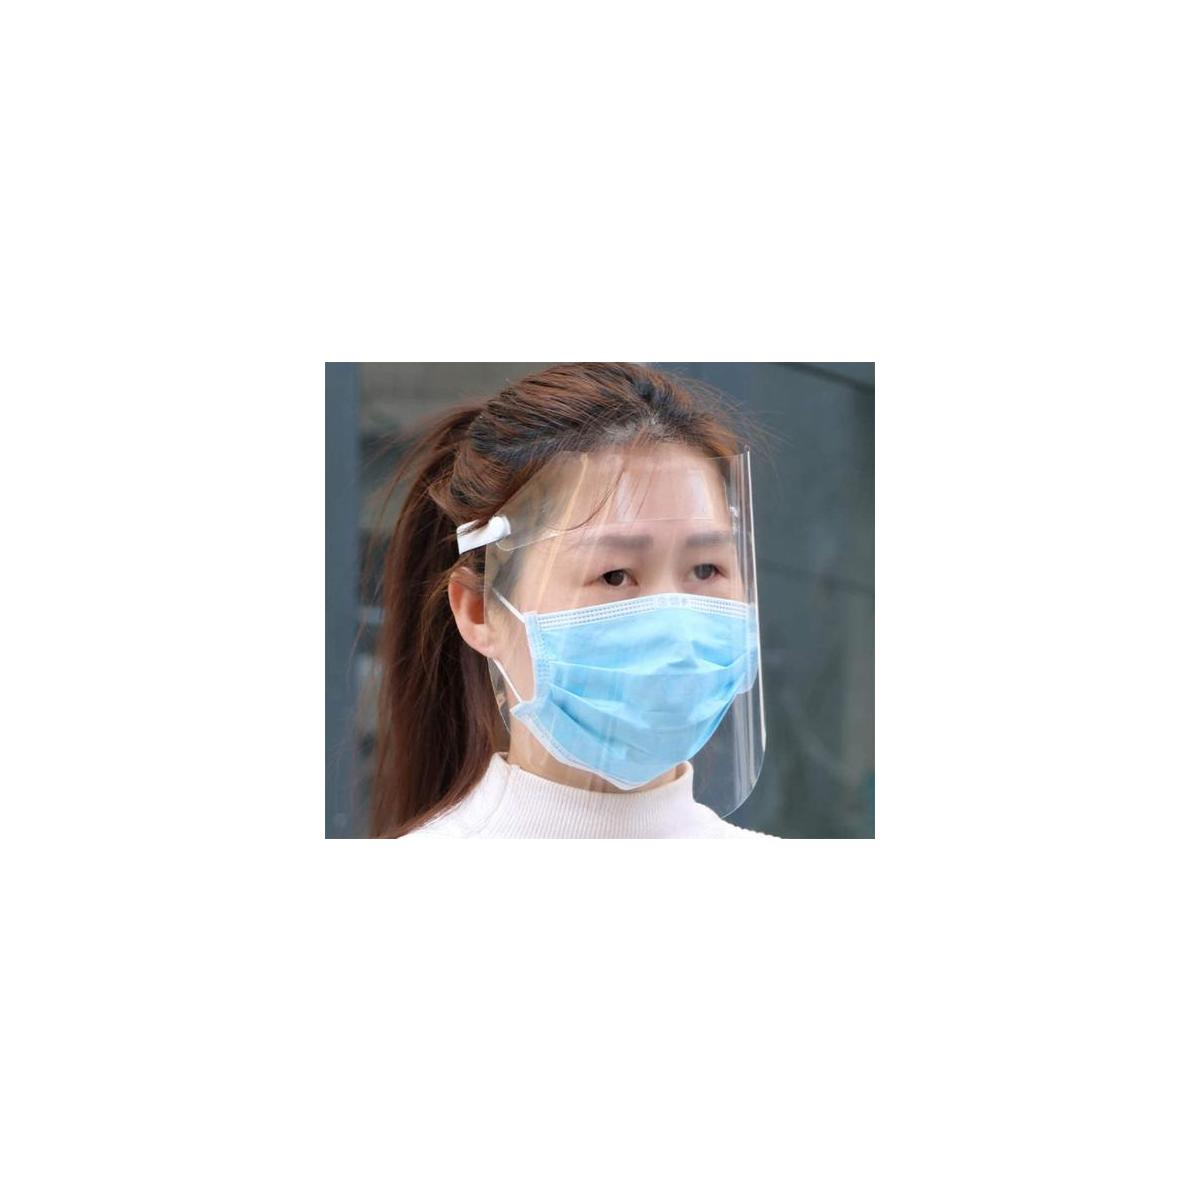 Transparent Anti-Fog Protective Face Screen Drip-Proof Dust-Proof Rain-Proof Oil-Proof Full-Face Screan Sun Visor